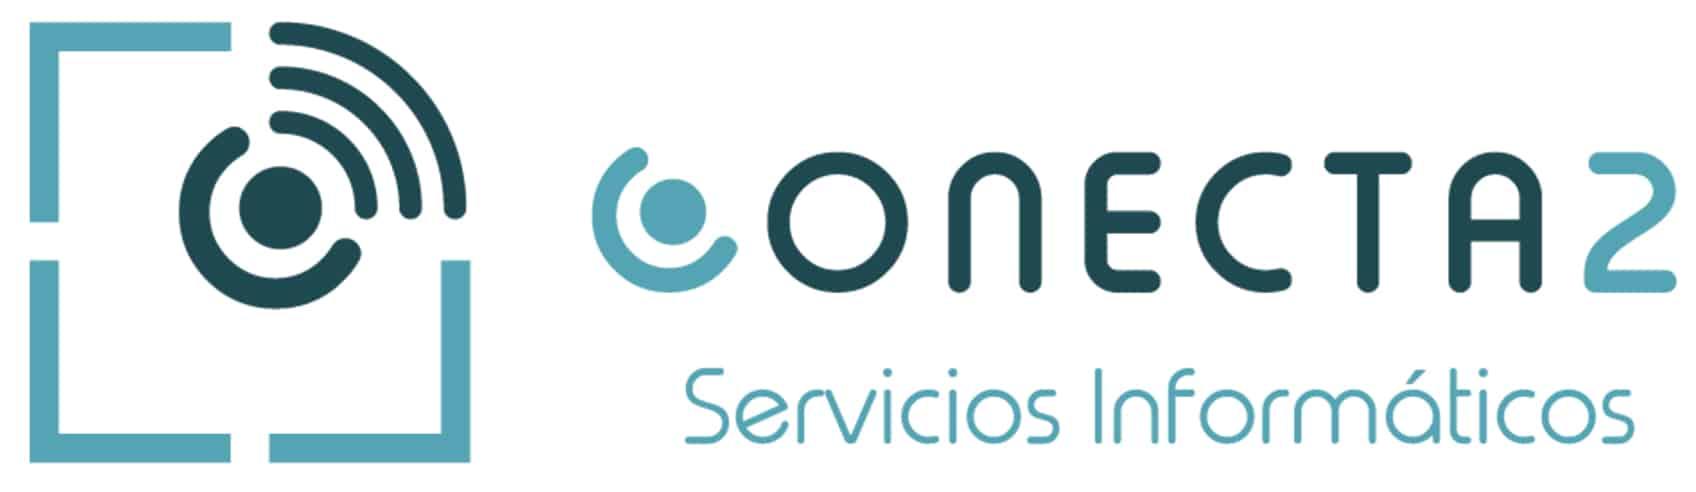 Inforconecta2 - Servicios Informáticos